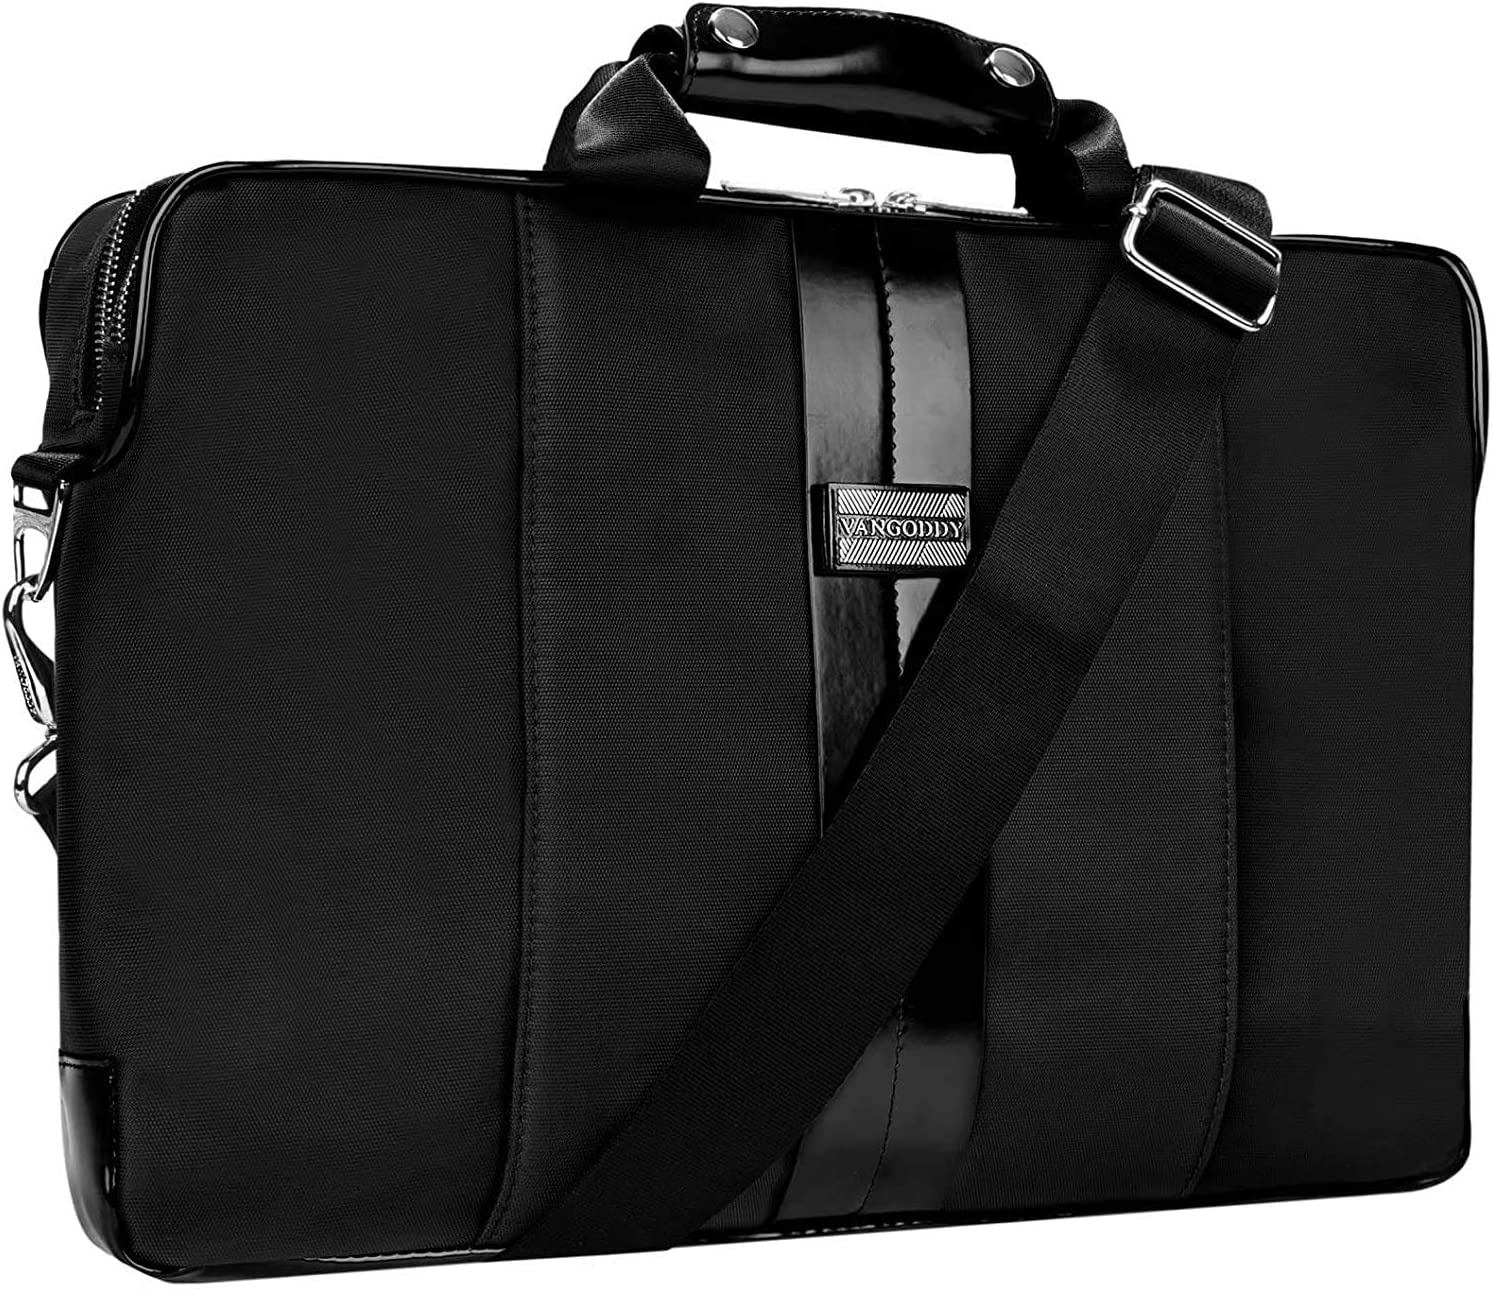 Laptop Bag for Dell Inspiron 15 New Razer Blade 15 Dell XPS 17 HP Pavilion15.6